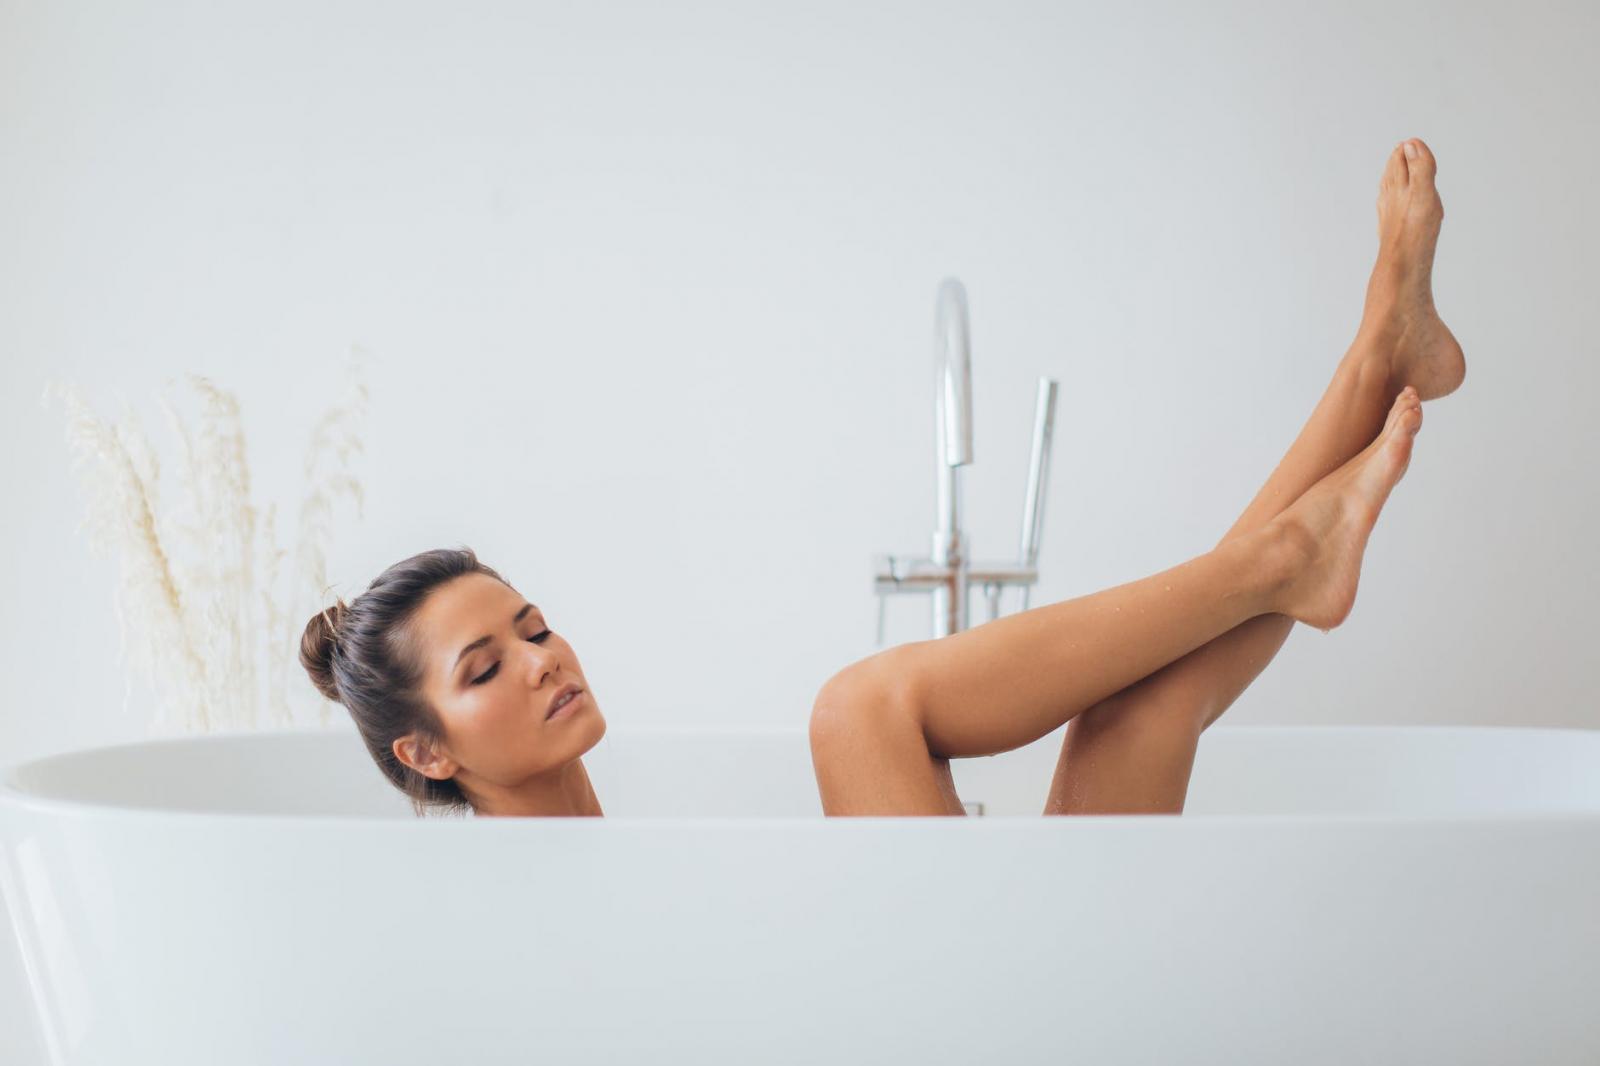 DIY除毛5大重點!洗澡後2小時是黃金時間,外出穿淺色衣服,除毛膏禁忌不要犯-3